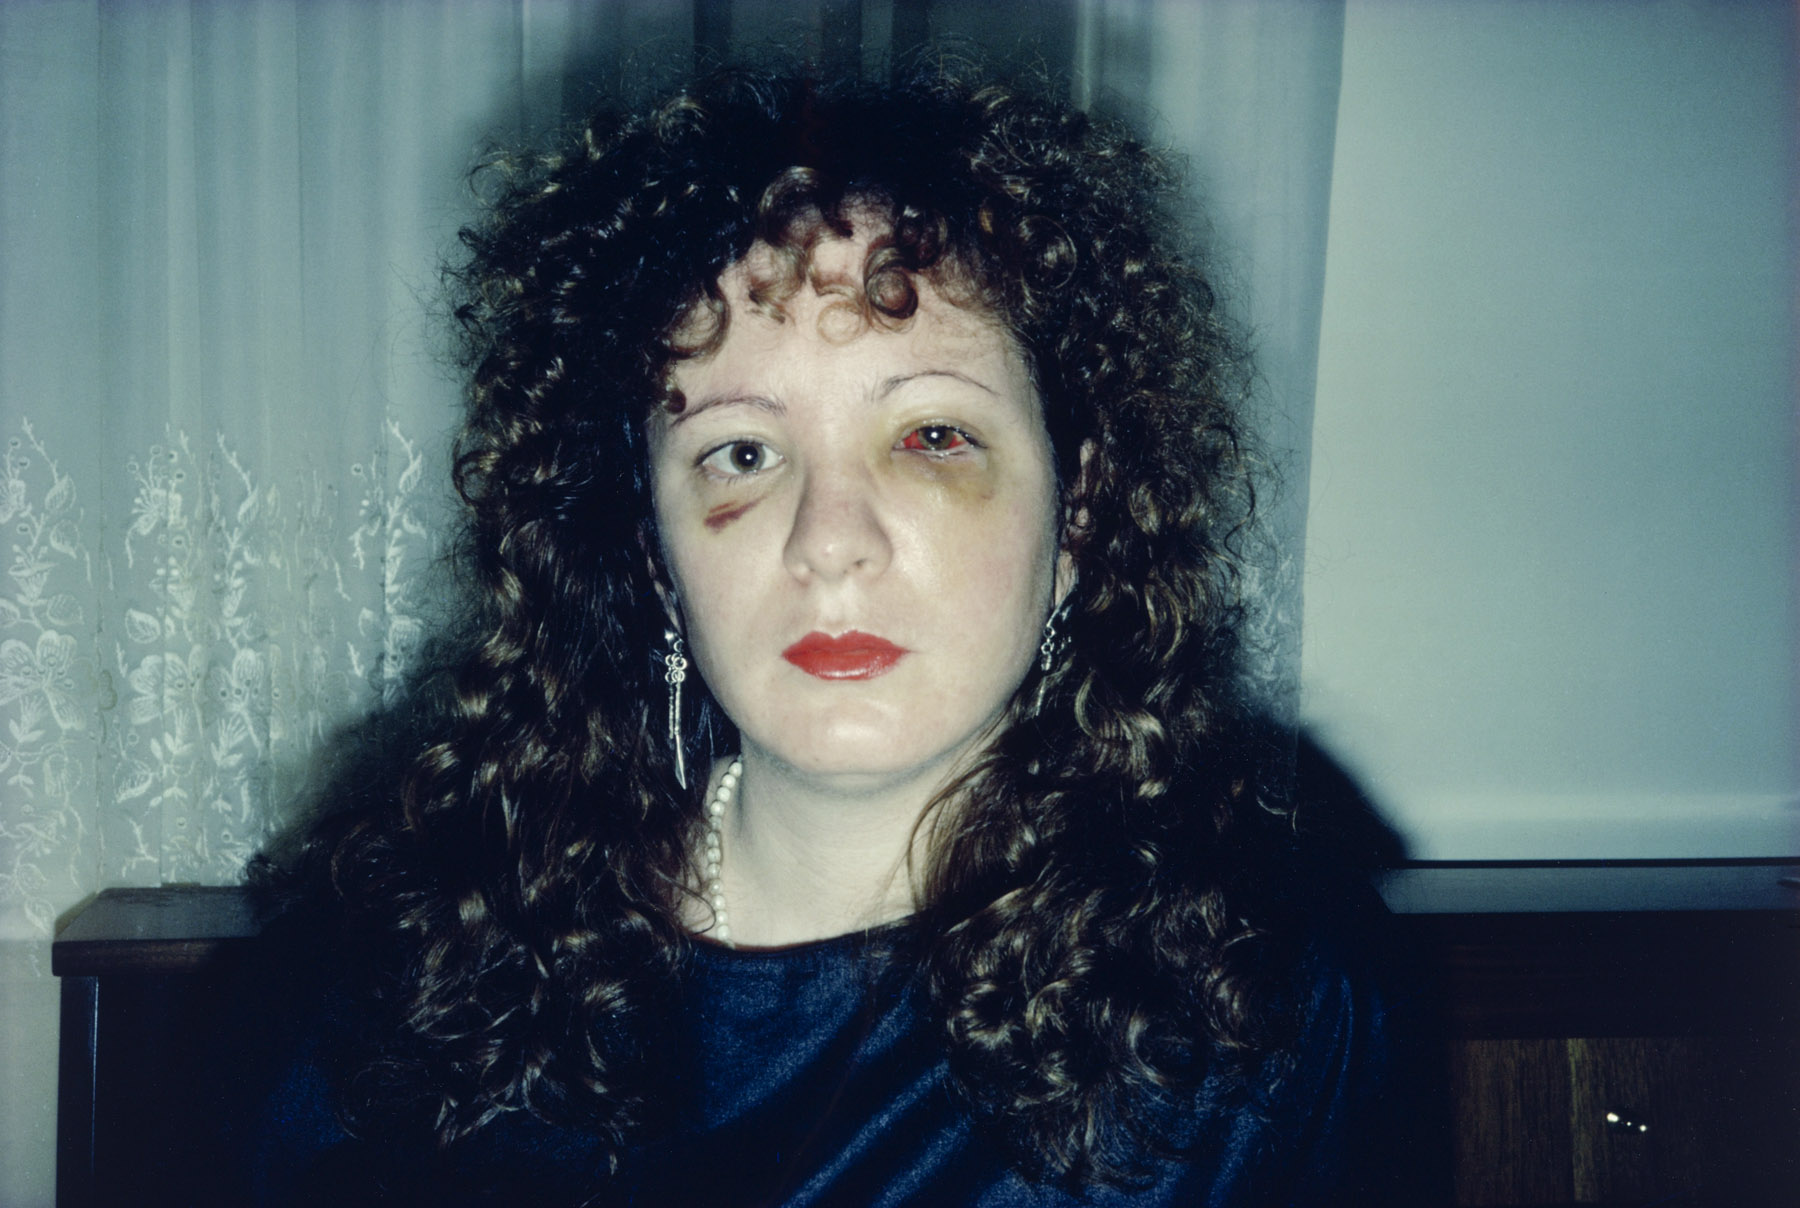 Fotó: Nan, one month after being battered, 1984 © Nan Goldin